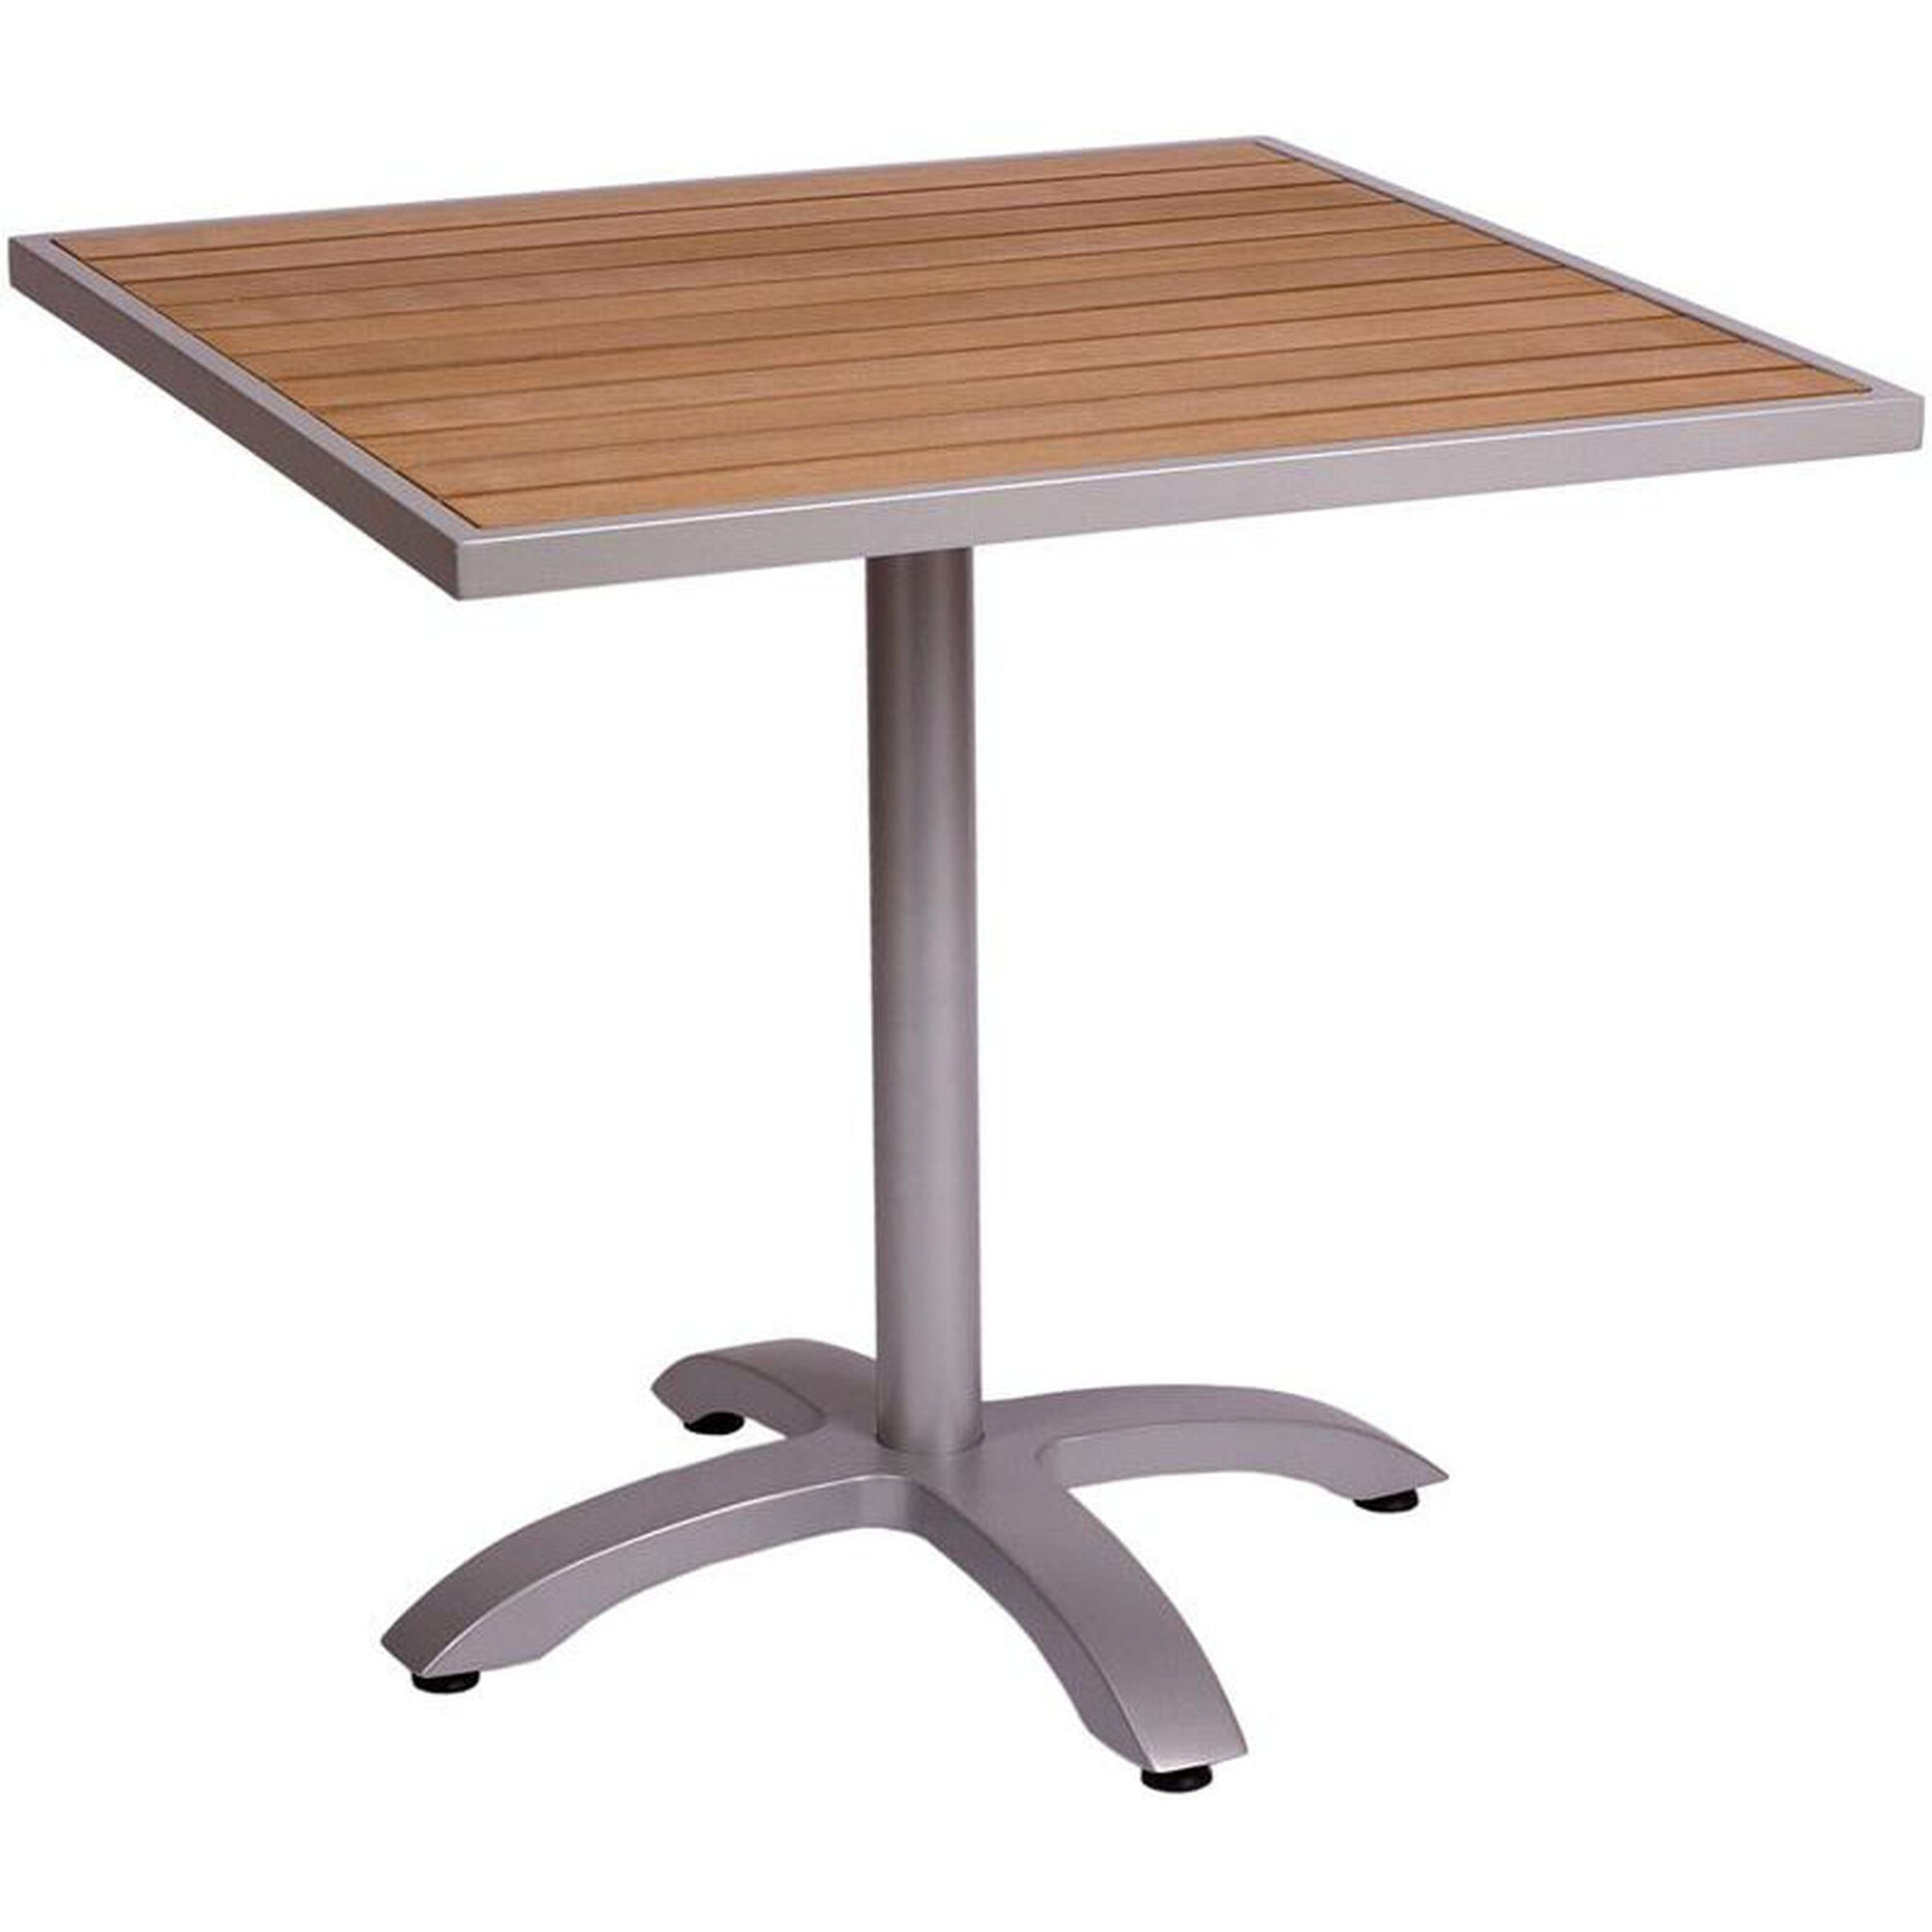 Square Teak Top Dining Table Ph3636tksv Phtb2626sv